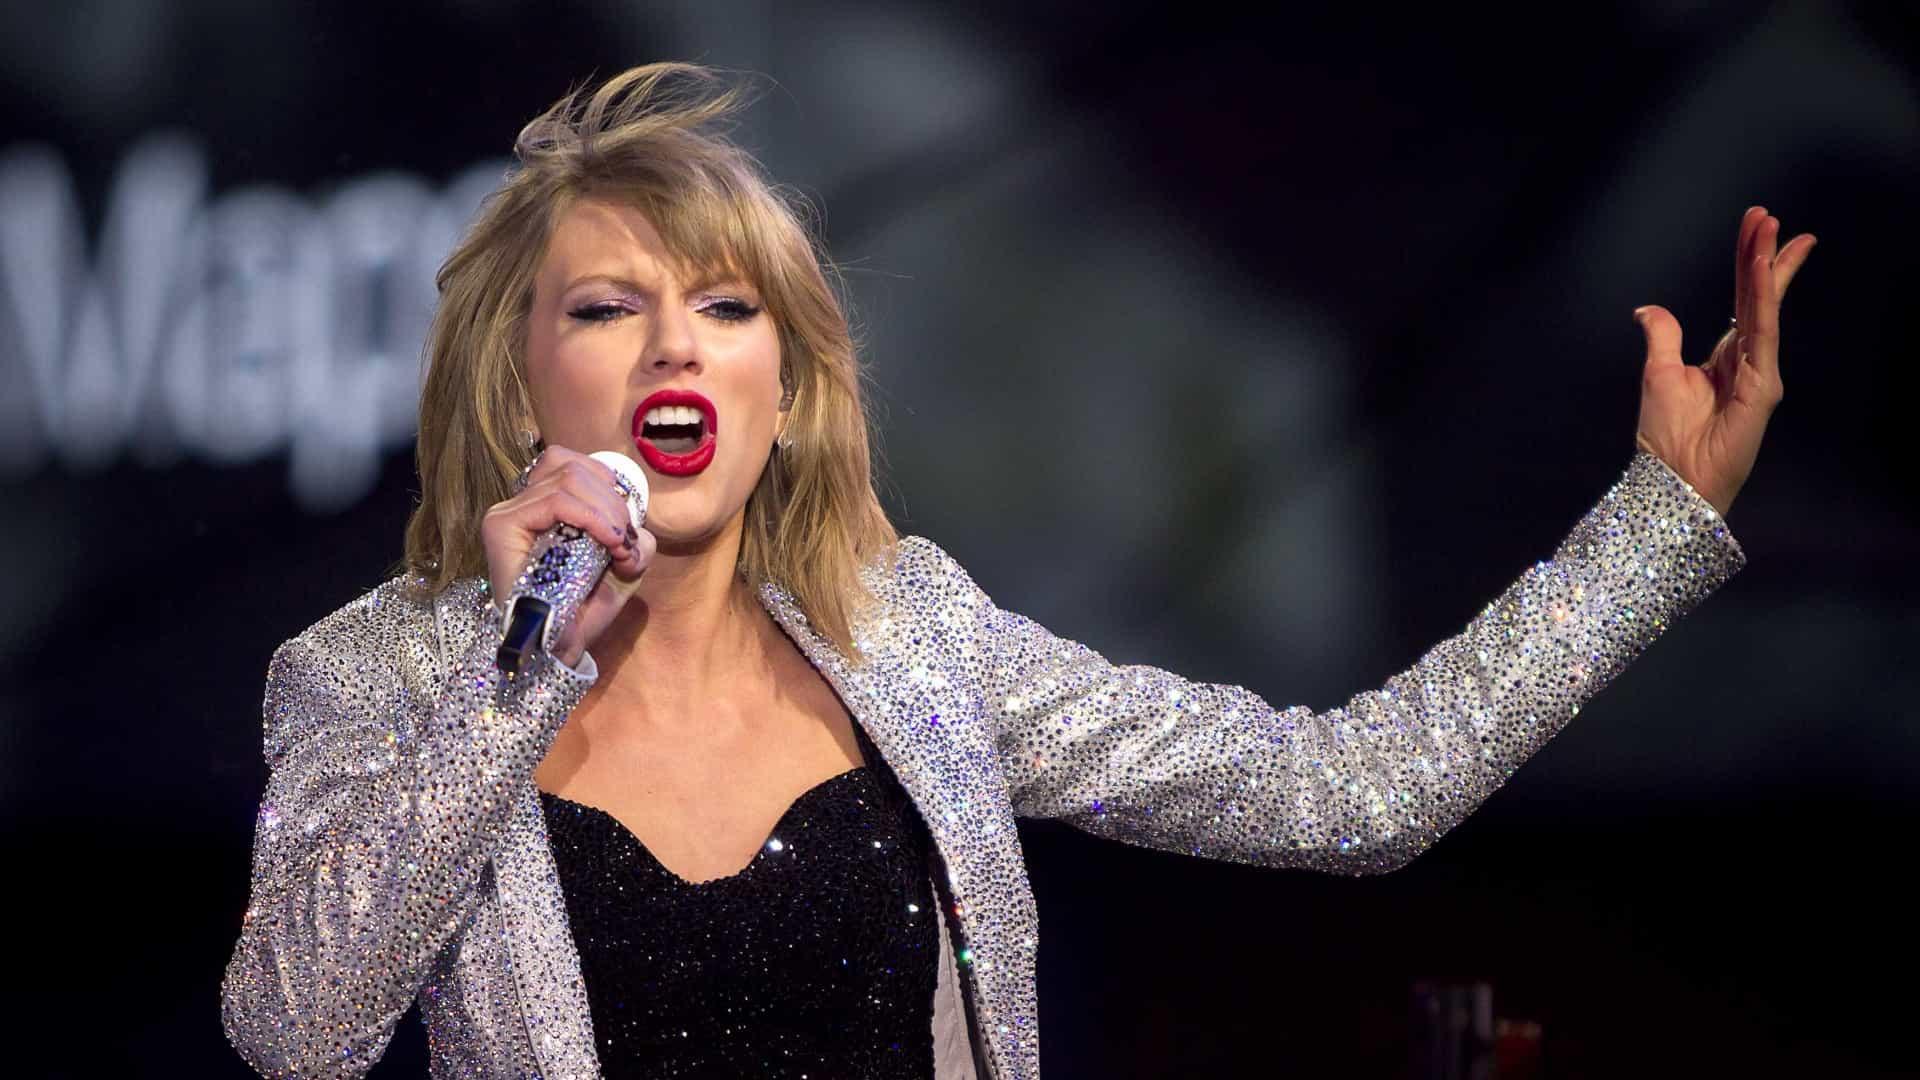 Taylor Swift virá ao Brasil em 2020 com turnê do novo álbum